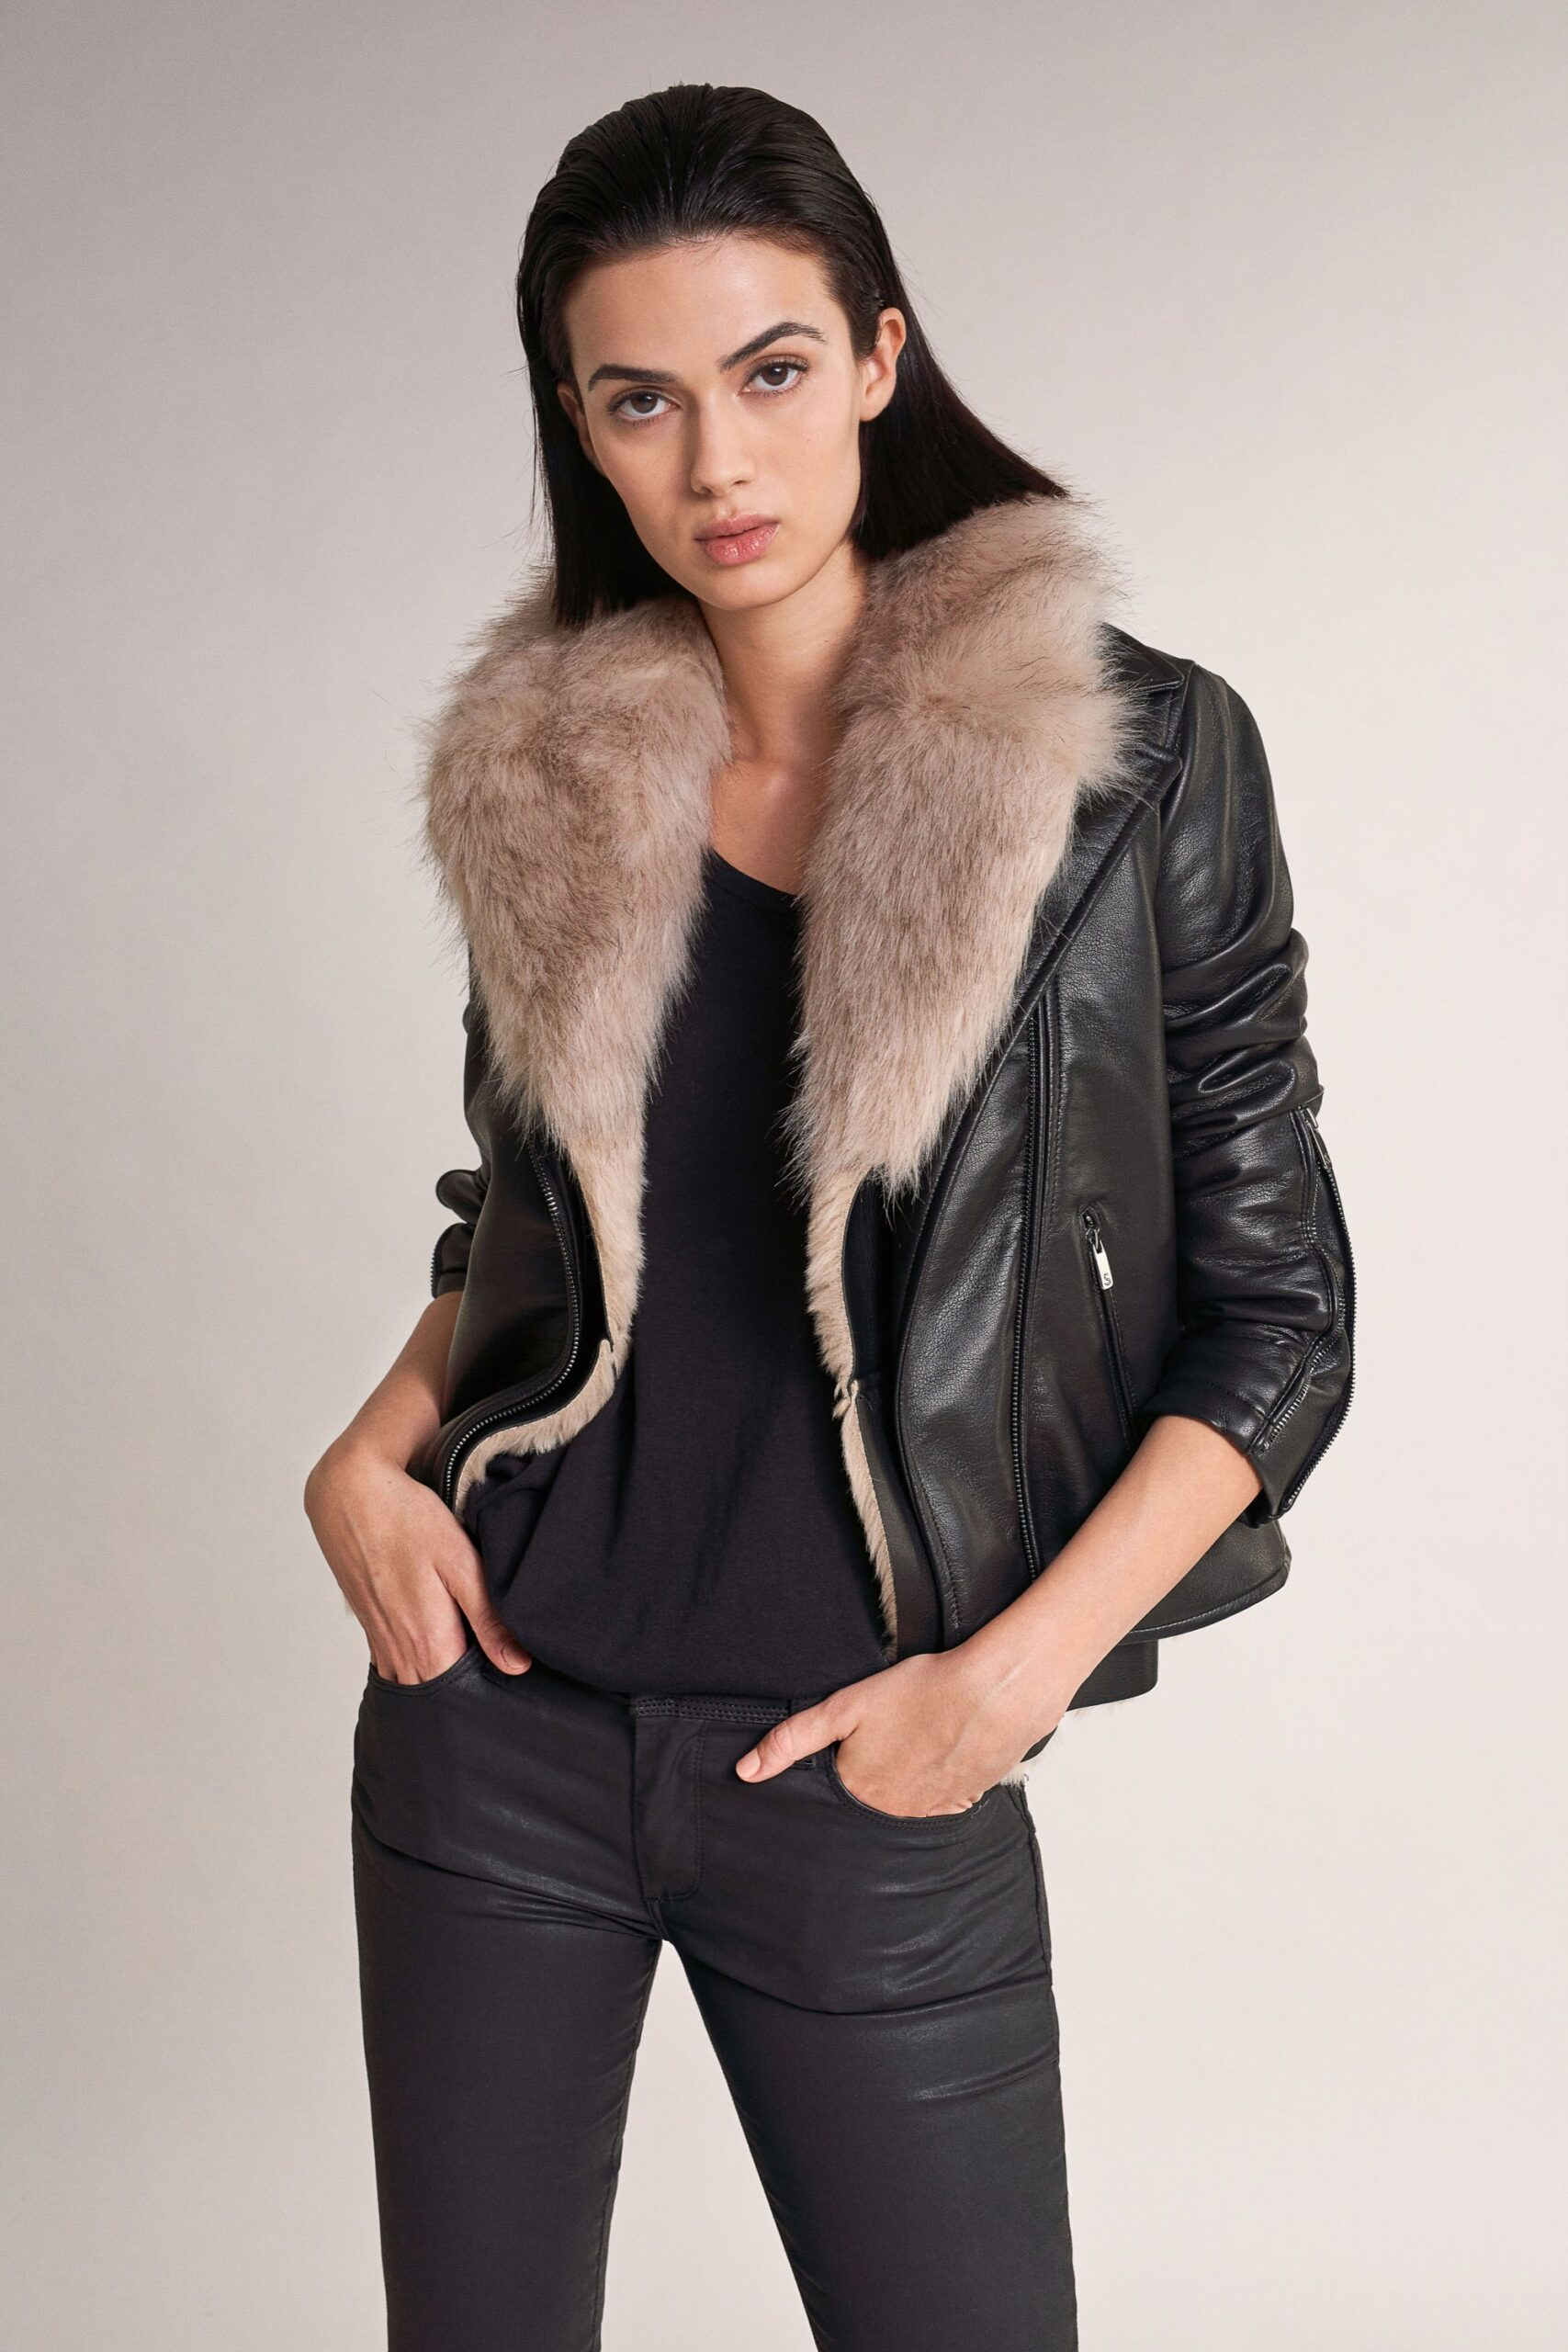 Motard Jacket